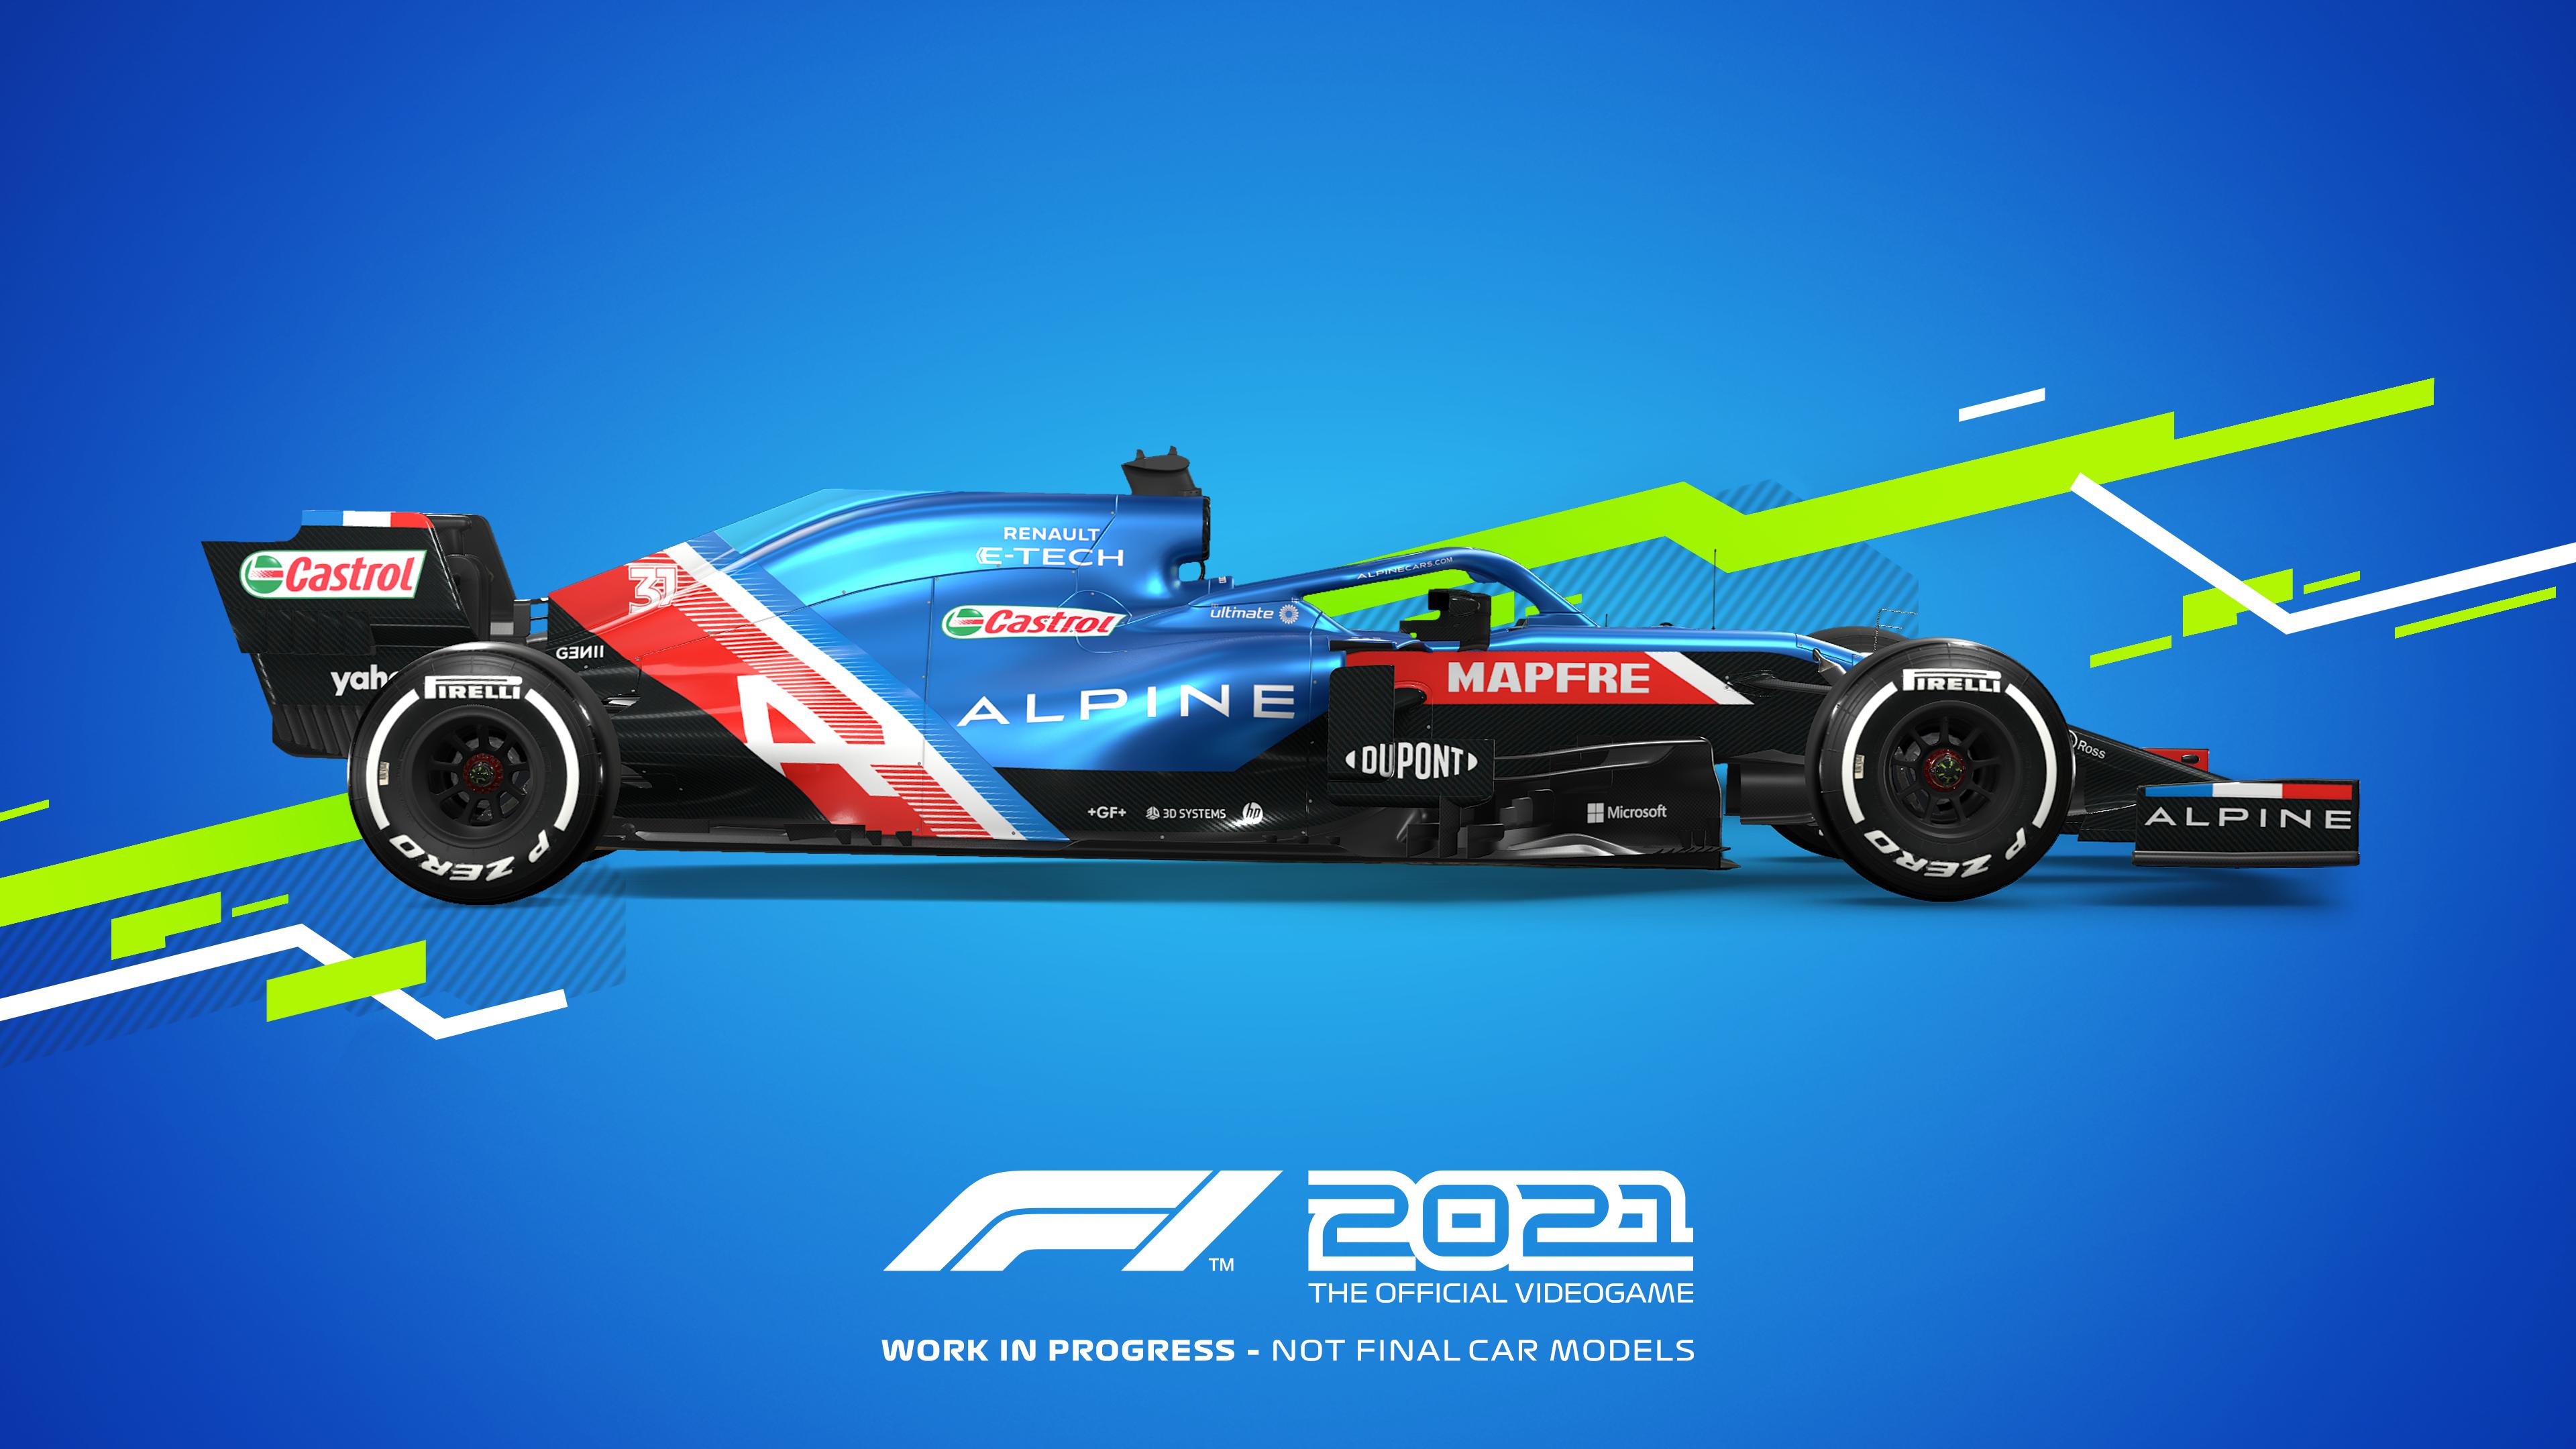 F12021_alpine_hybrid_OCO31_marketing_right